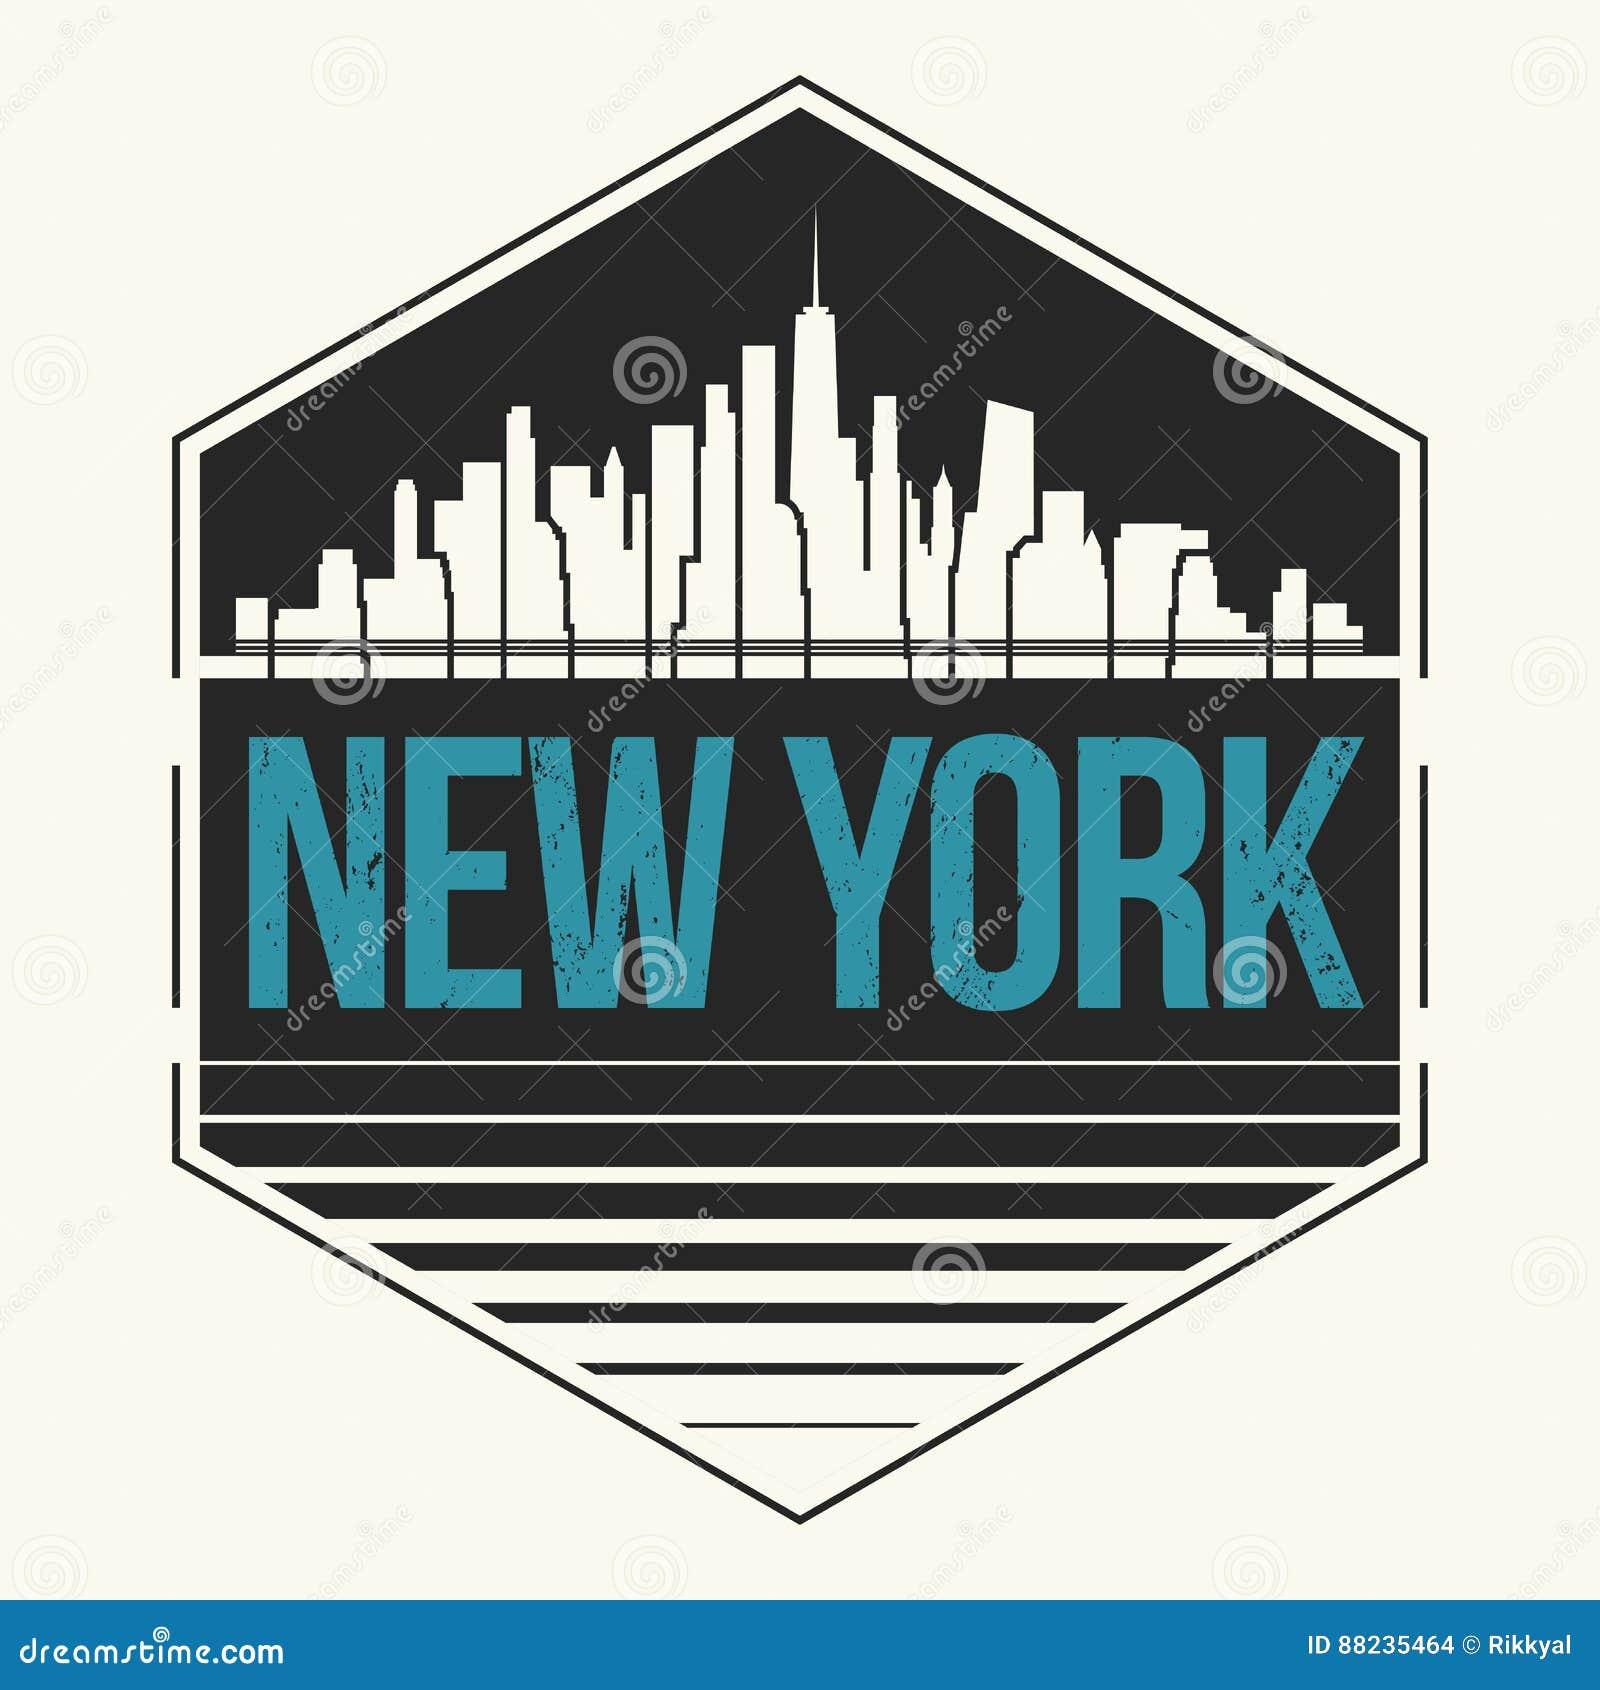 Shirt design nyc - New York City Graphic T Shirt Design Tee Print Typography